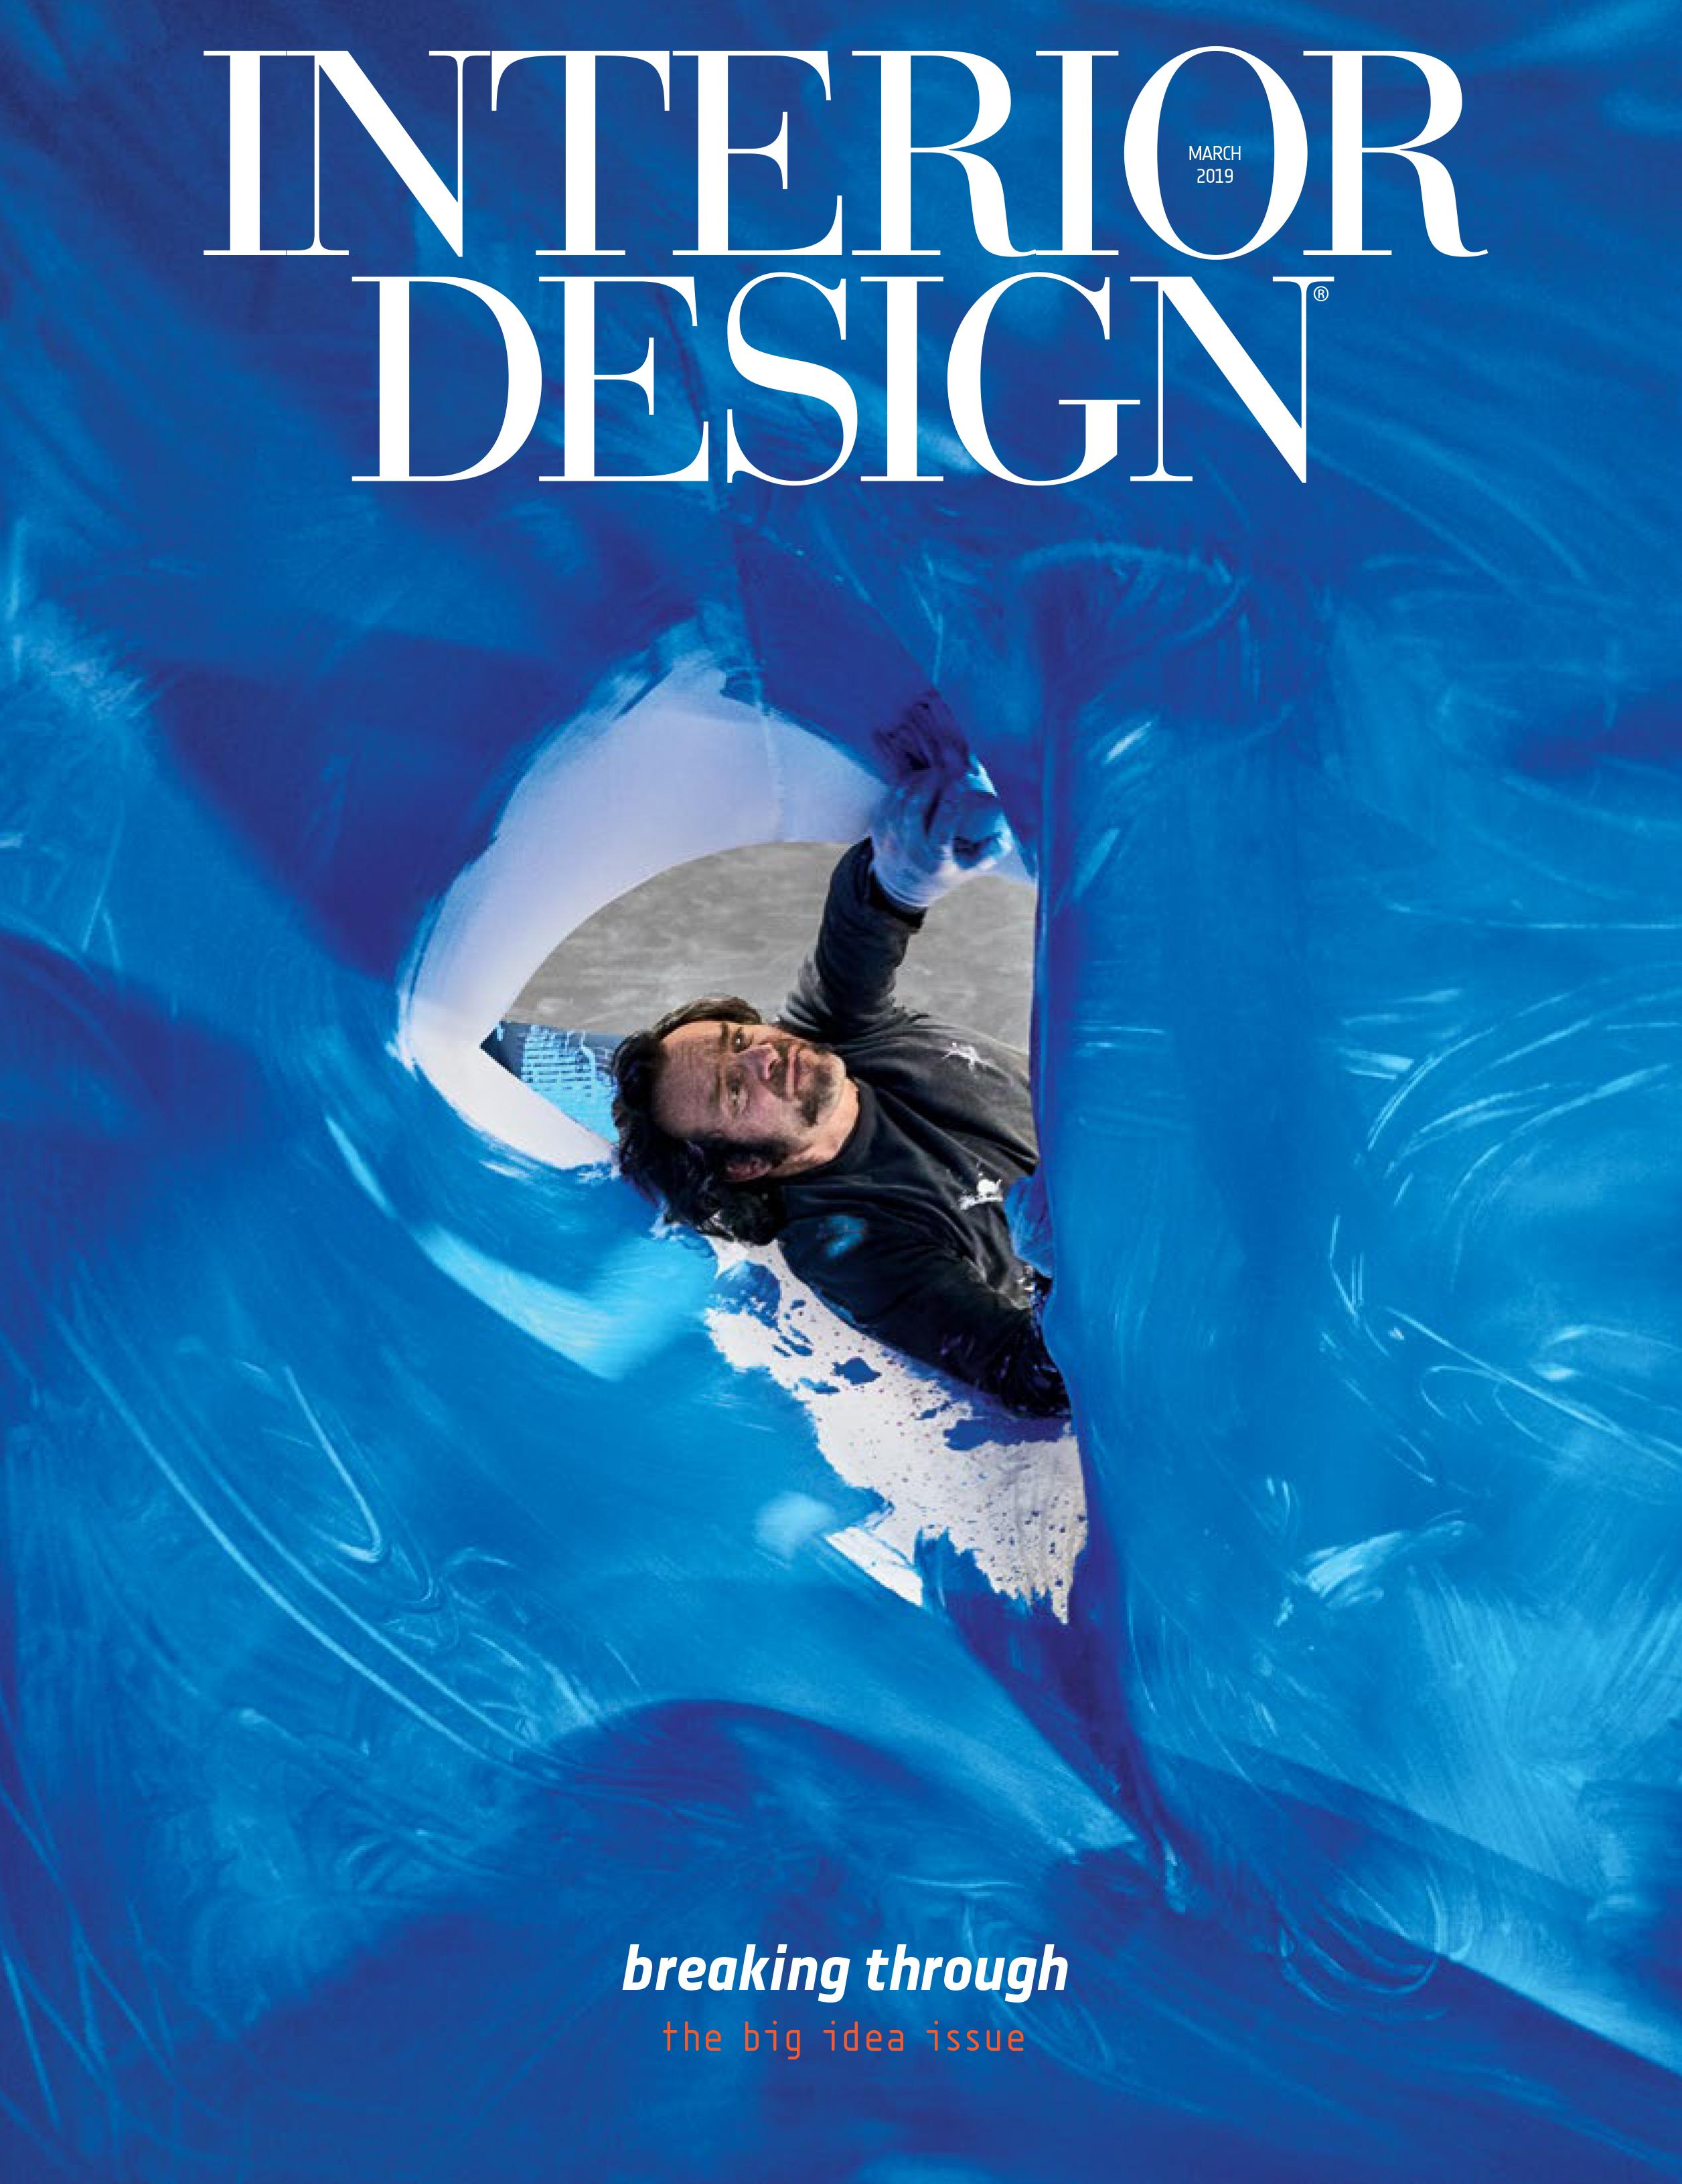 INTERIOR DESIGN_magazine landinez+rey arquitectos Clinica Dental Chamberi